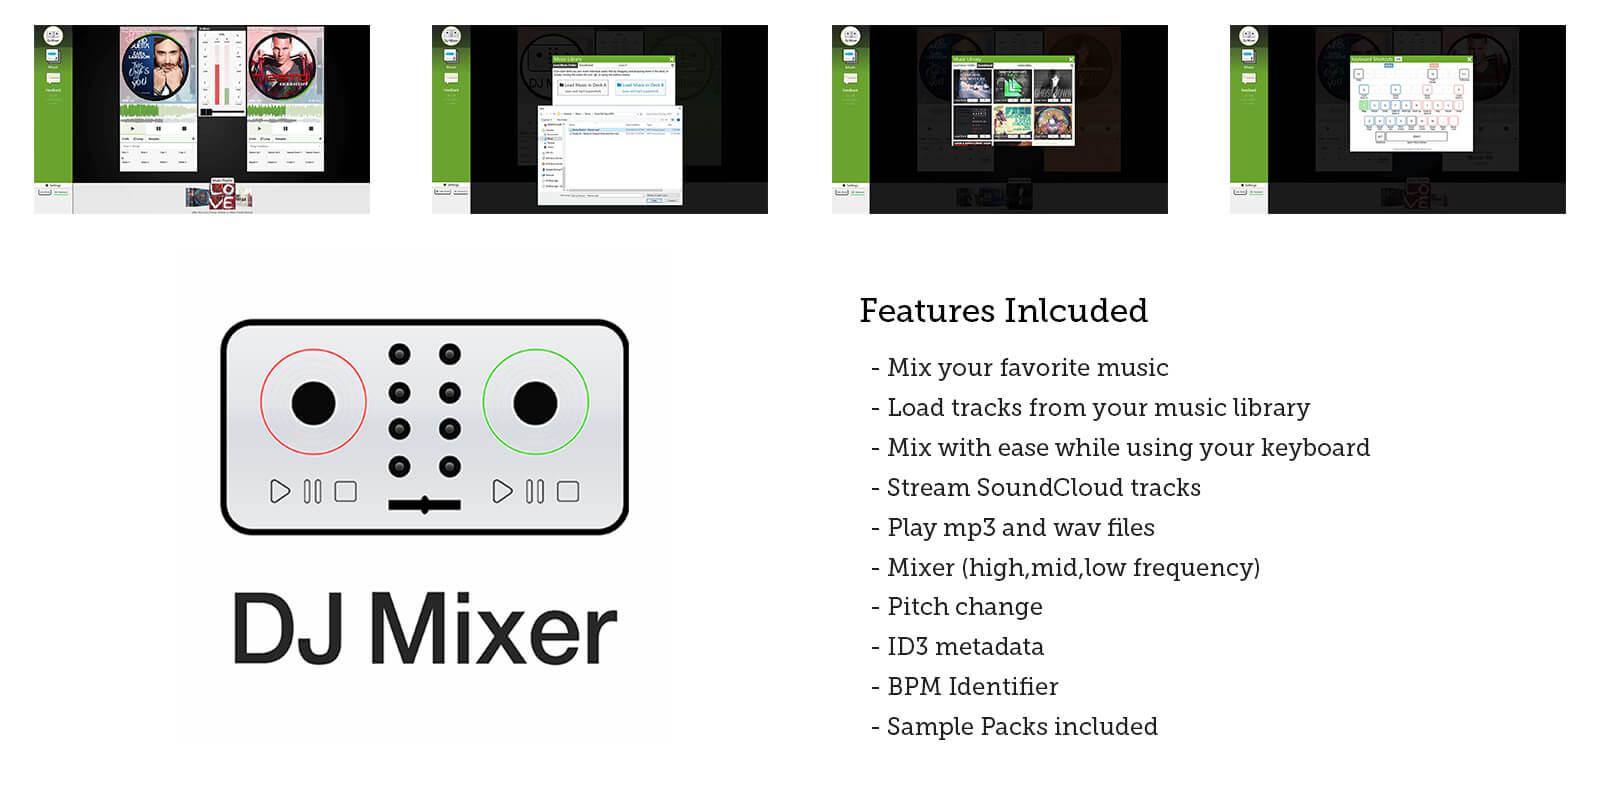 Enton Biba - Apps - DJ Mixer App - Mix Music